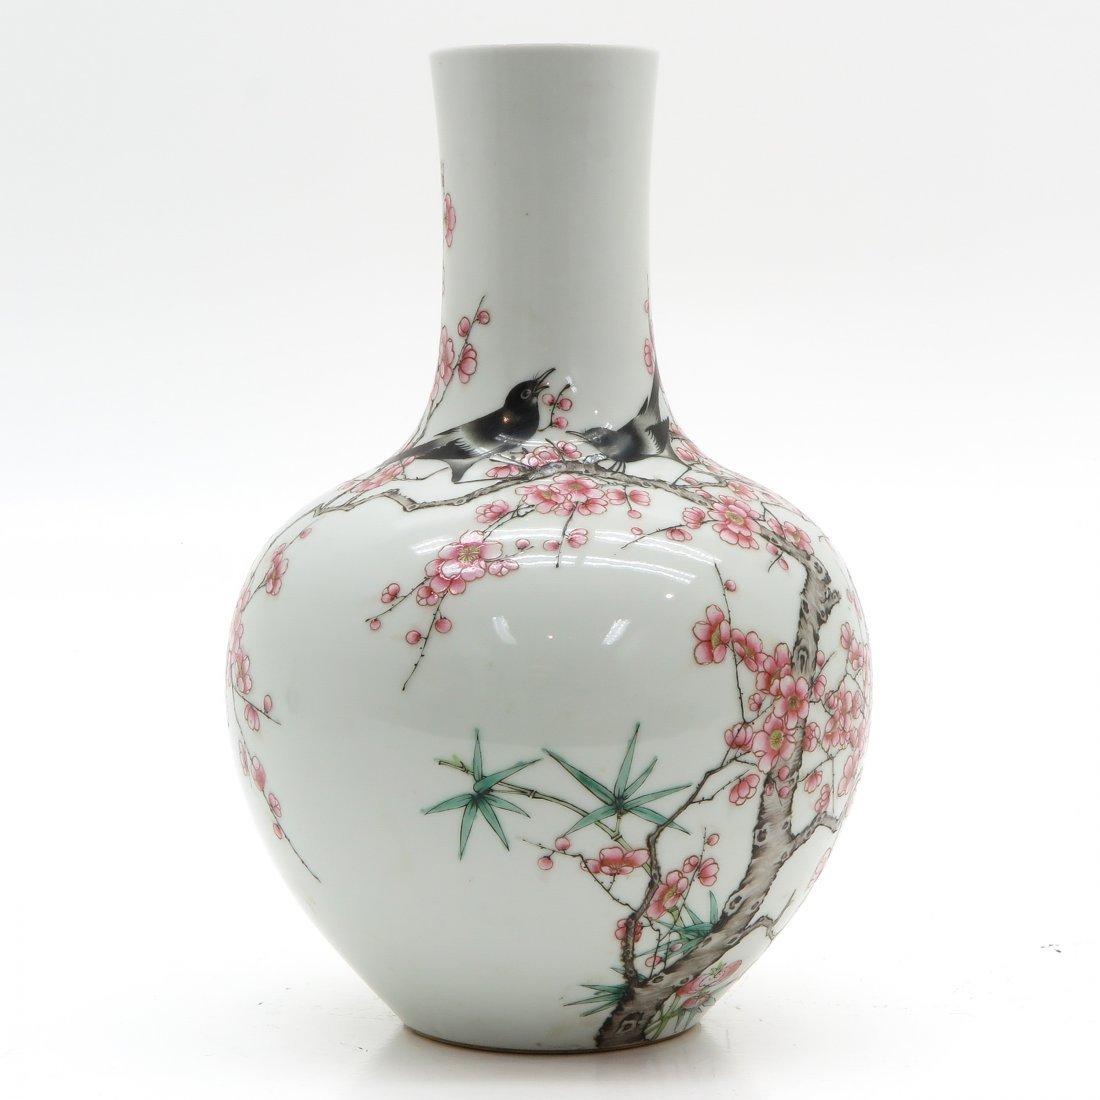 China Porcelain Vase Depicting Birds in Trees